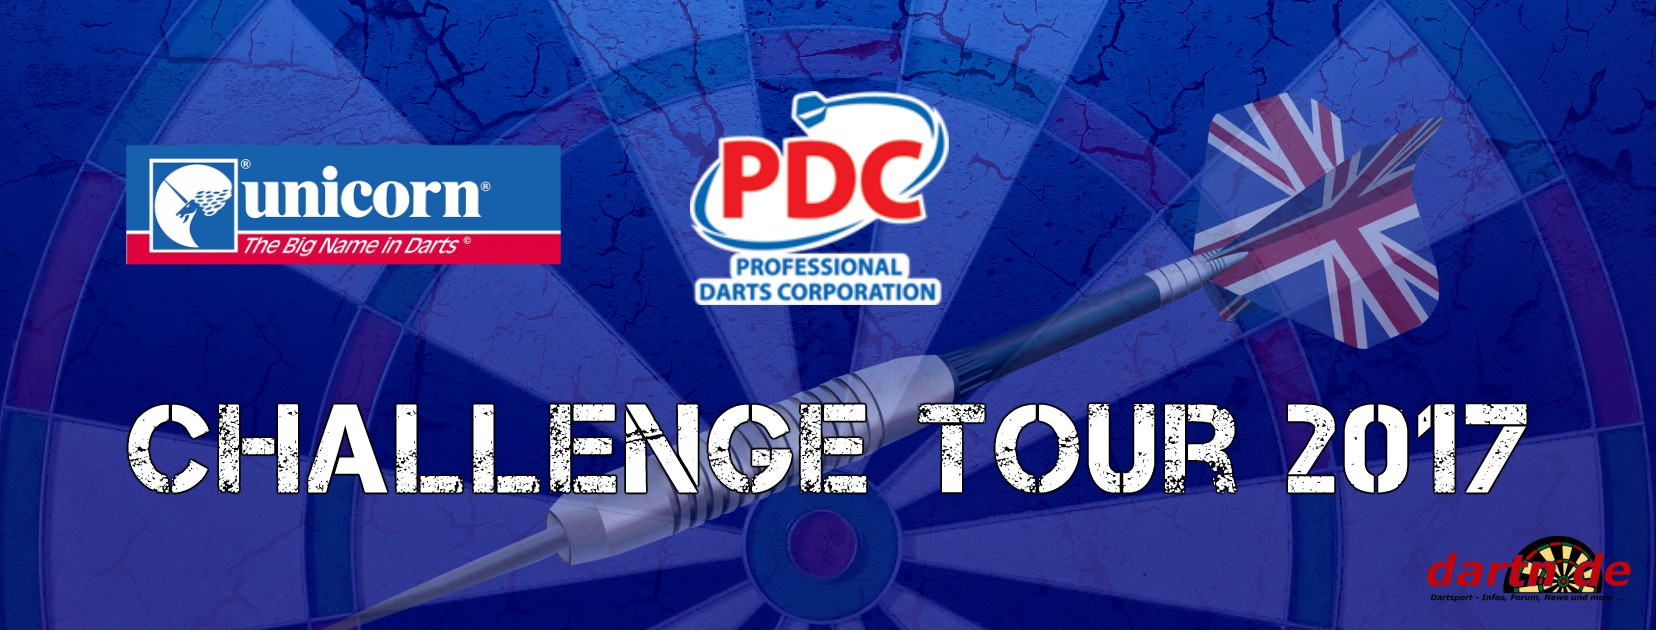 PDC Challenge Tour 2017